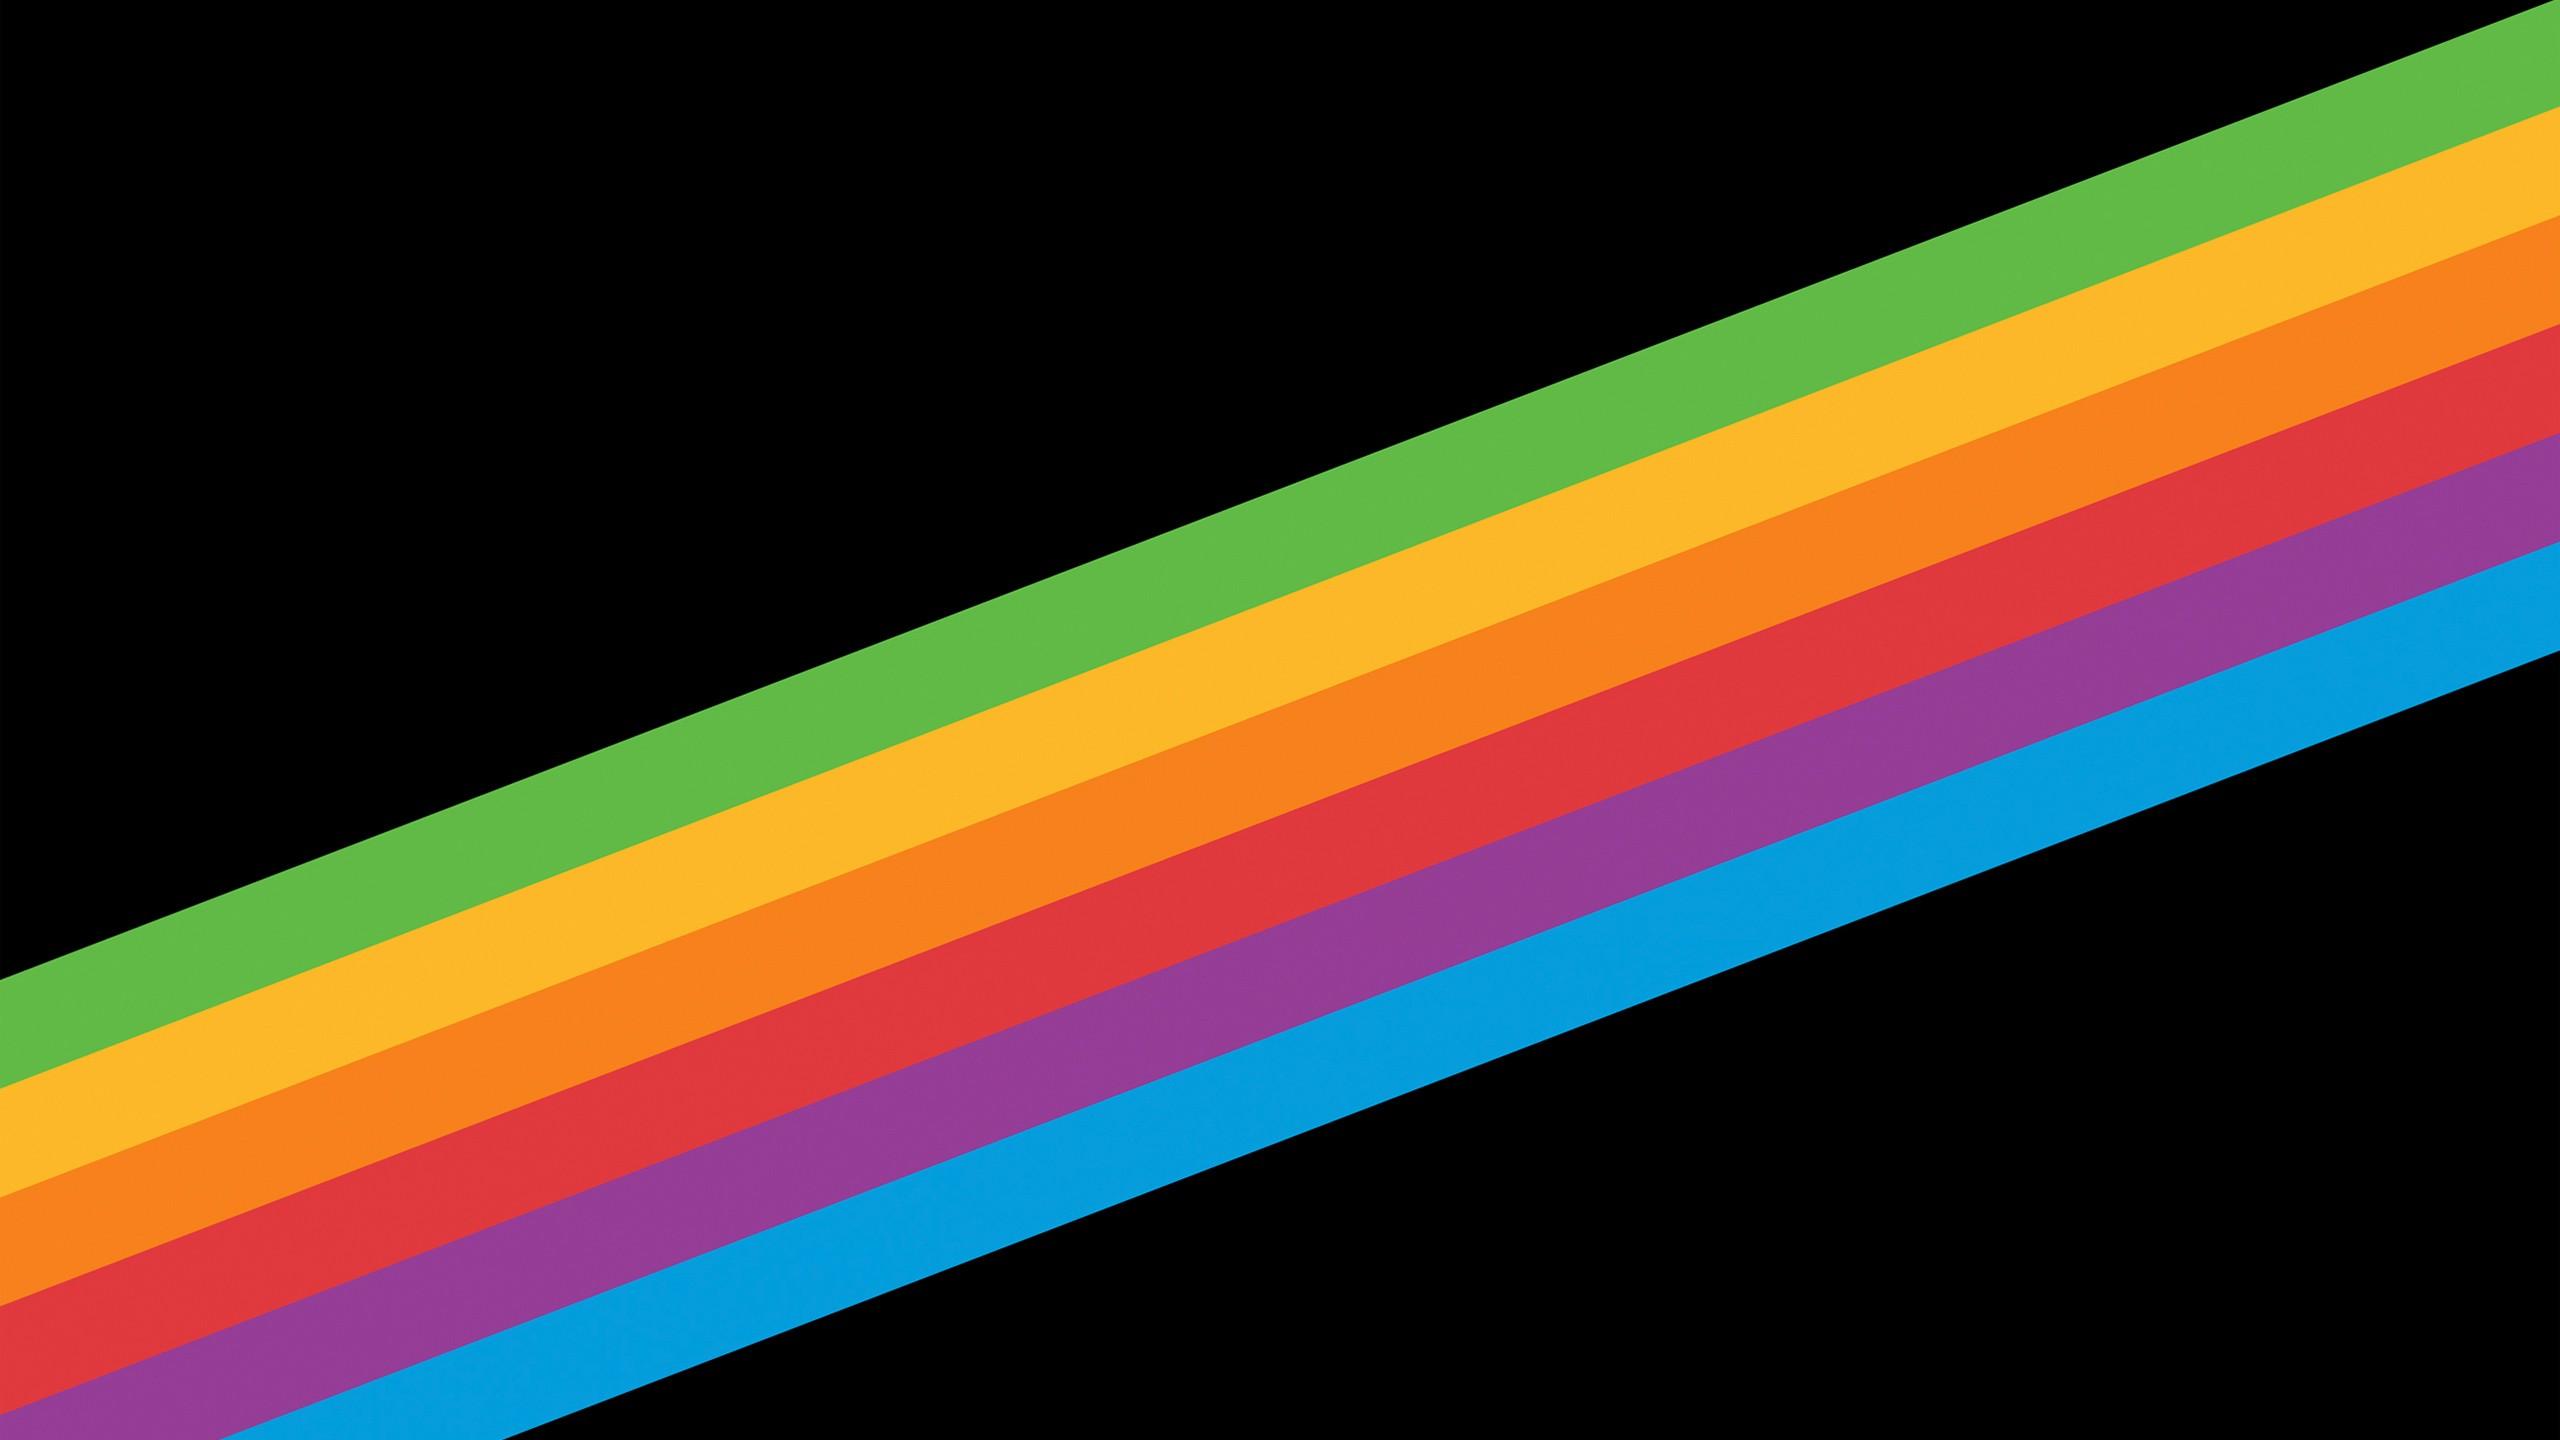 Heritage Rainbow Stripe Iphone X Iphone 8 Ios 11 Stock: 100+ Wallpaper Ios 11 Original Hd